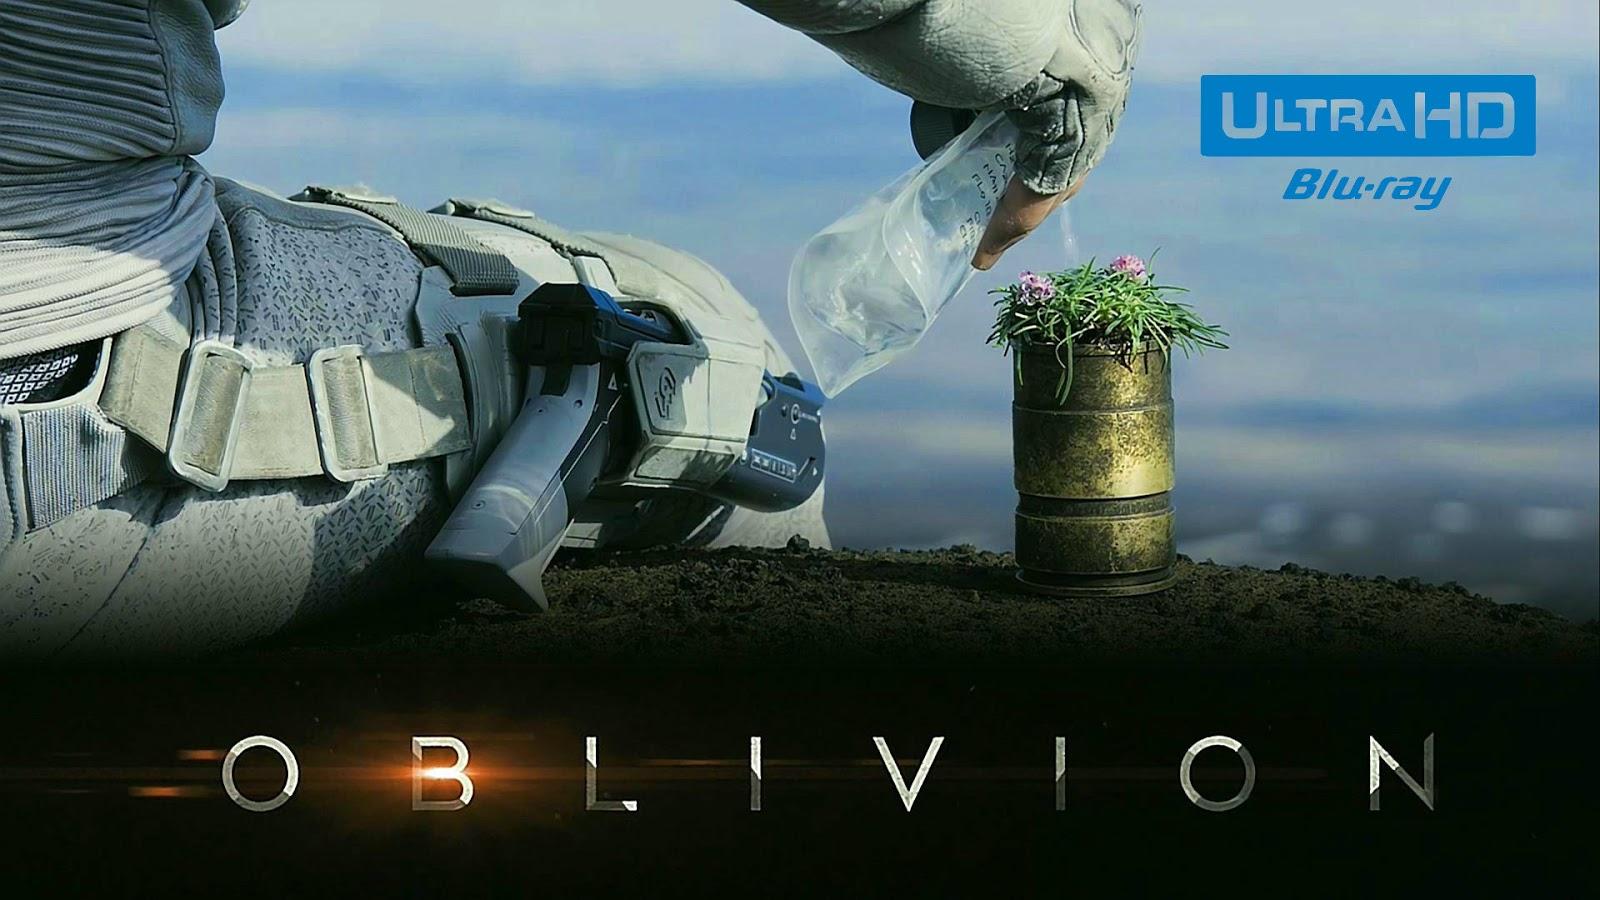 Oblivion 4K Blu-ray